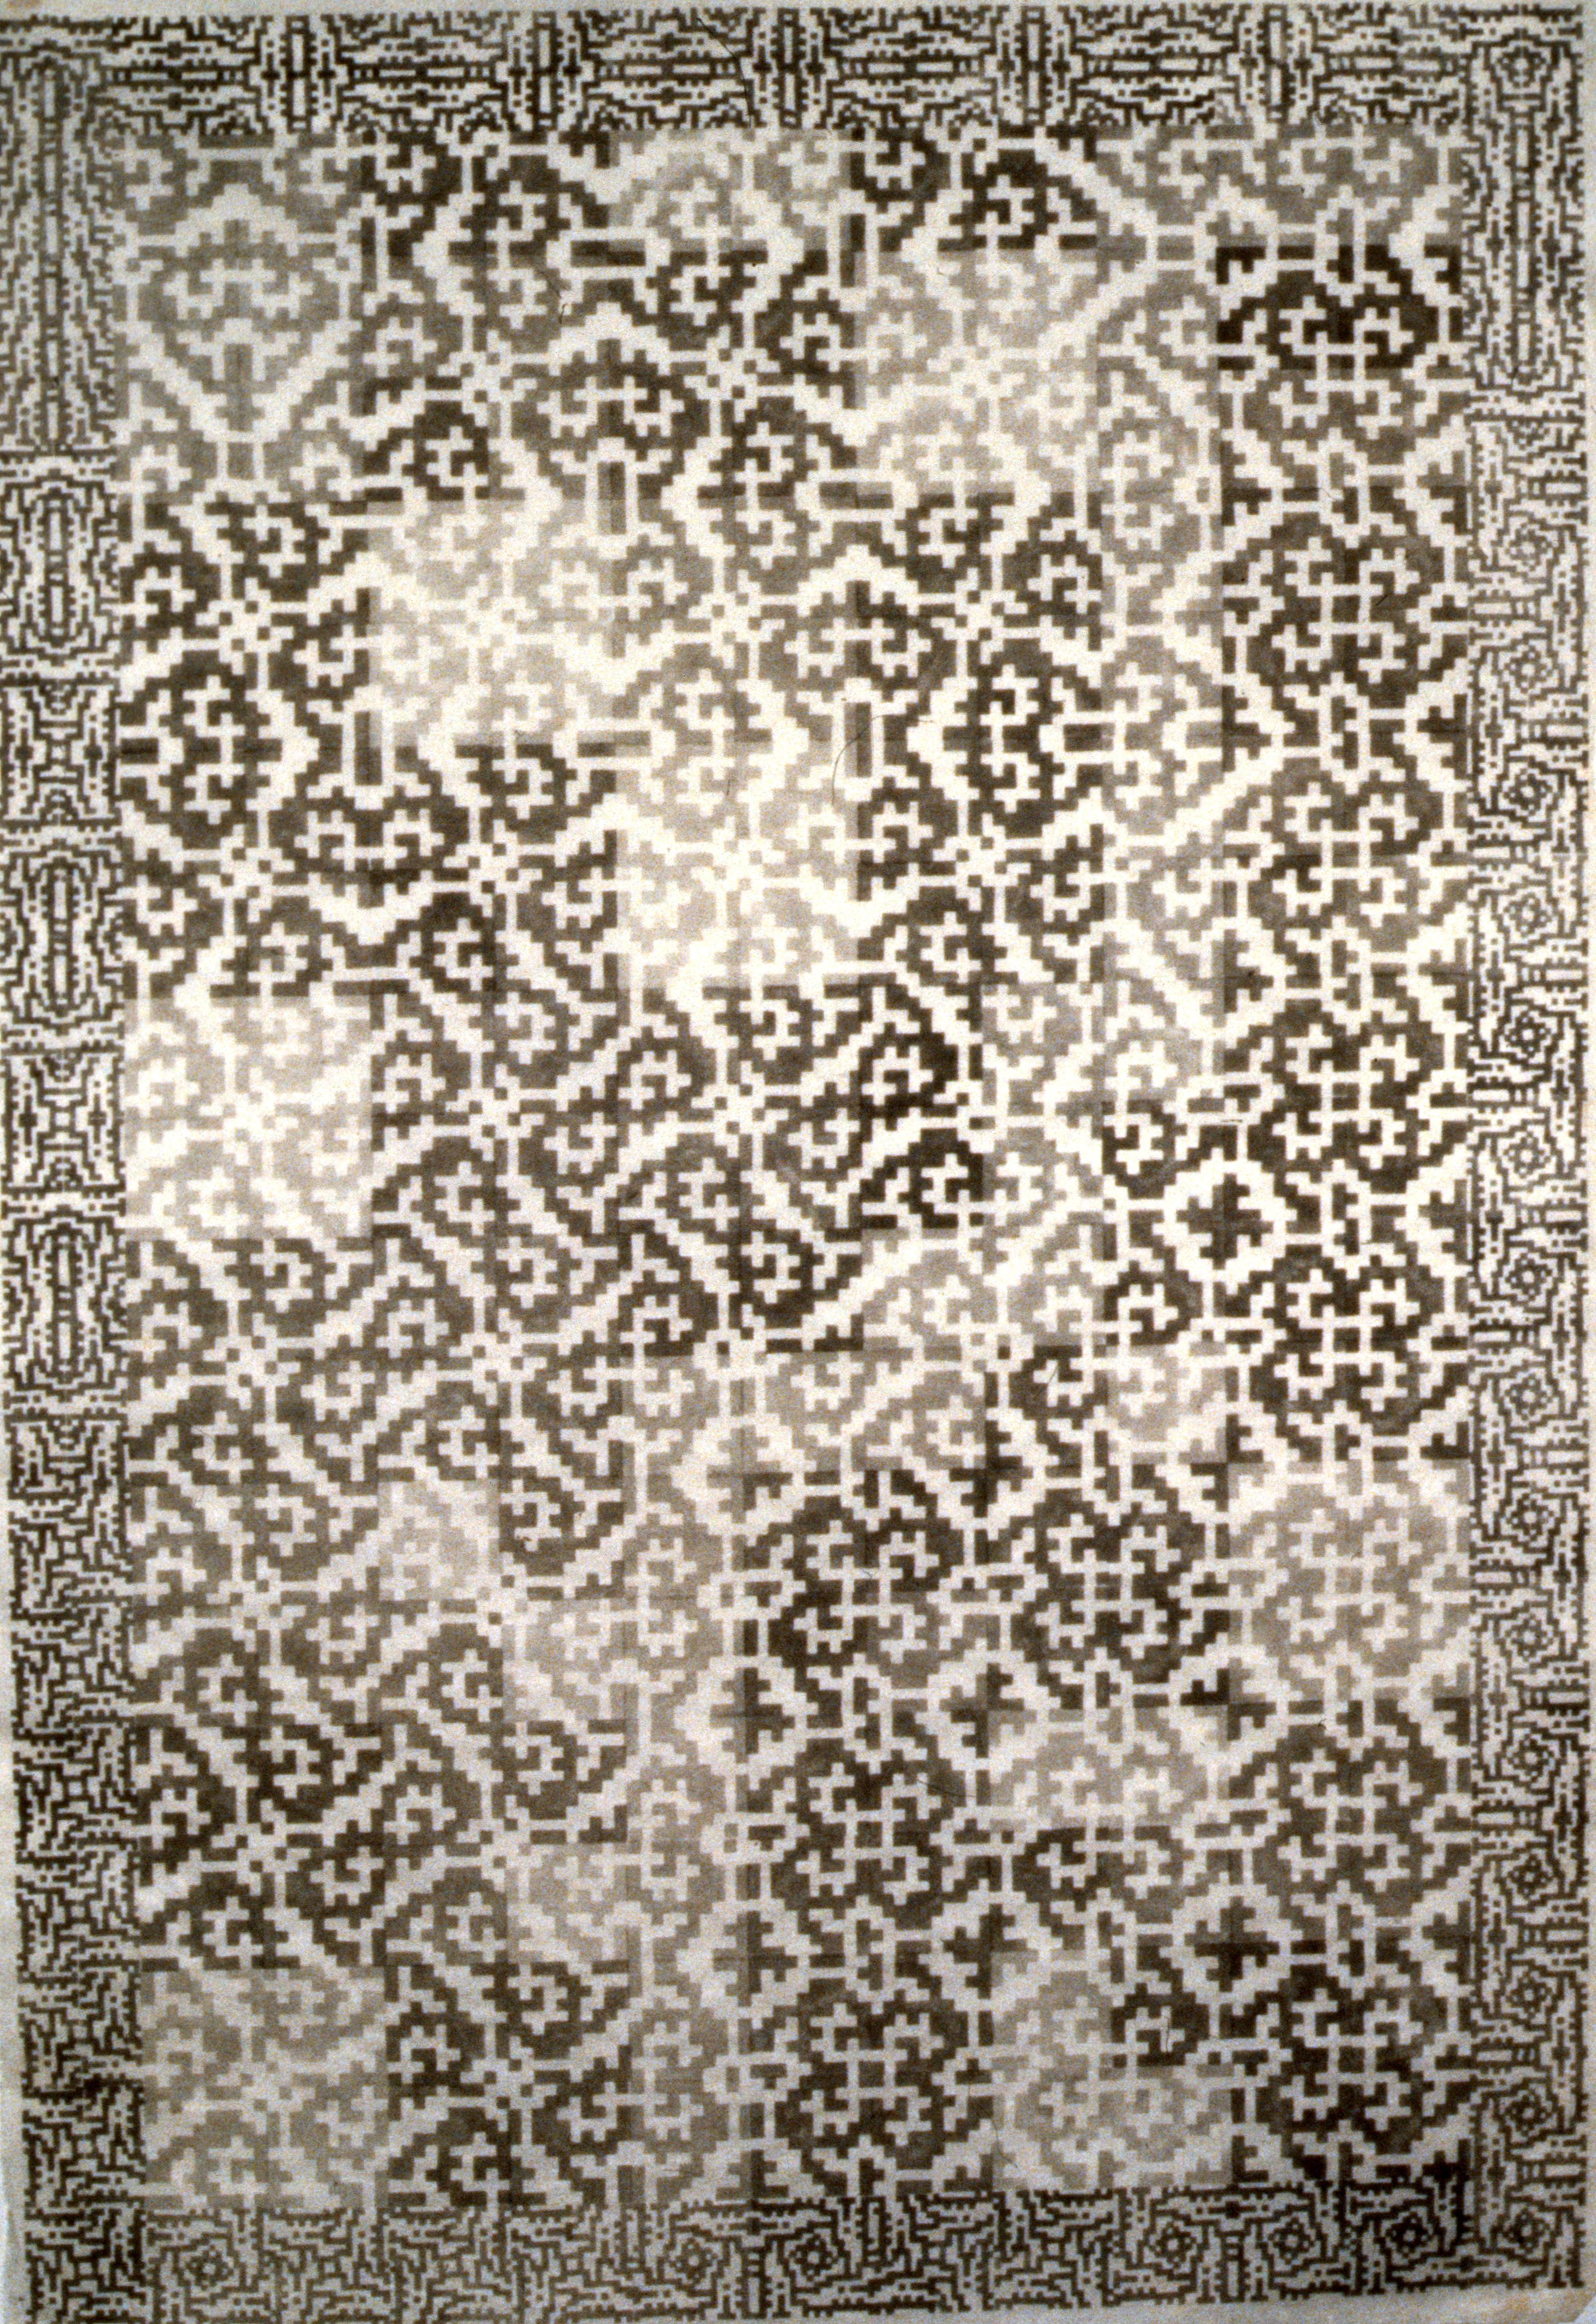 """Zephyr"" 1993 39-1/4x26-5/8"""